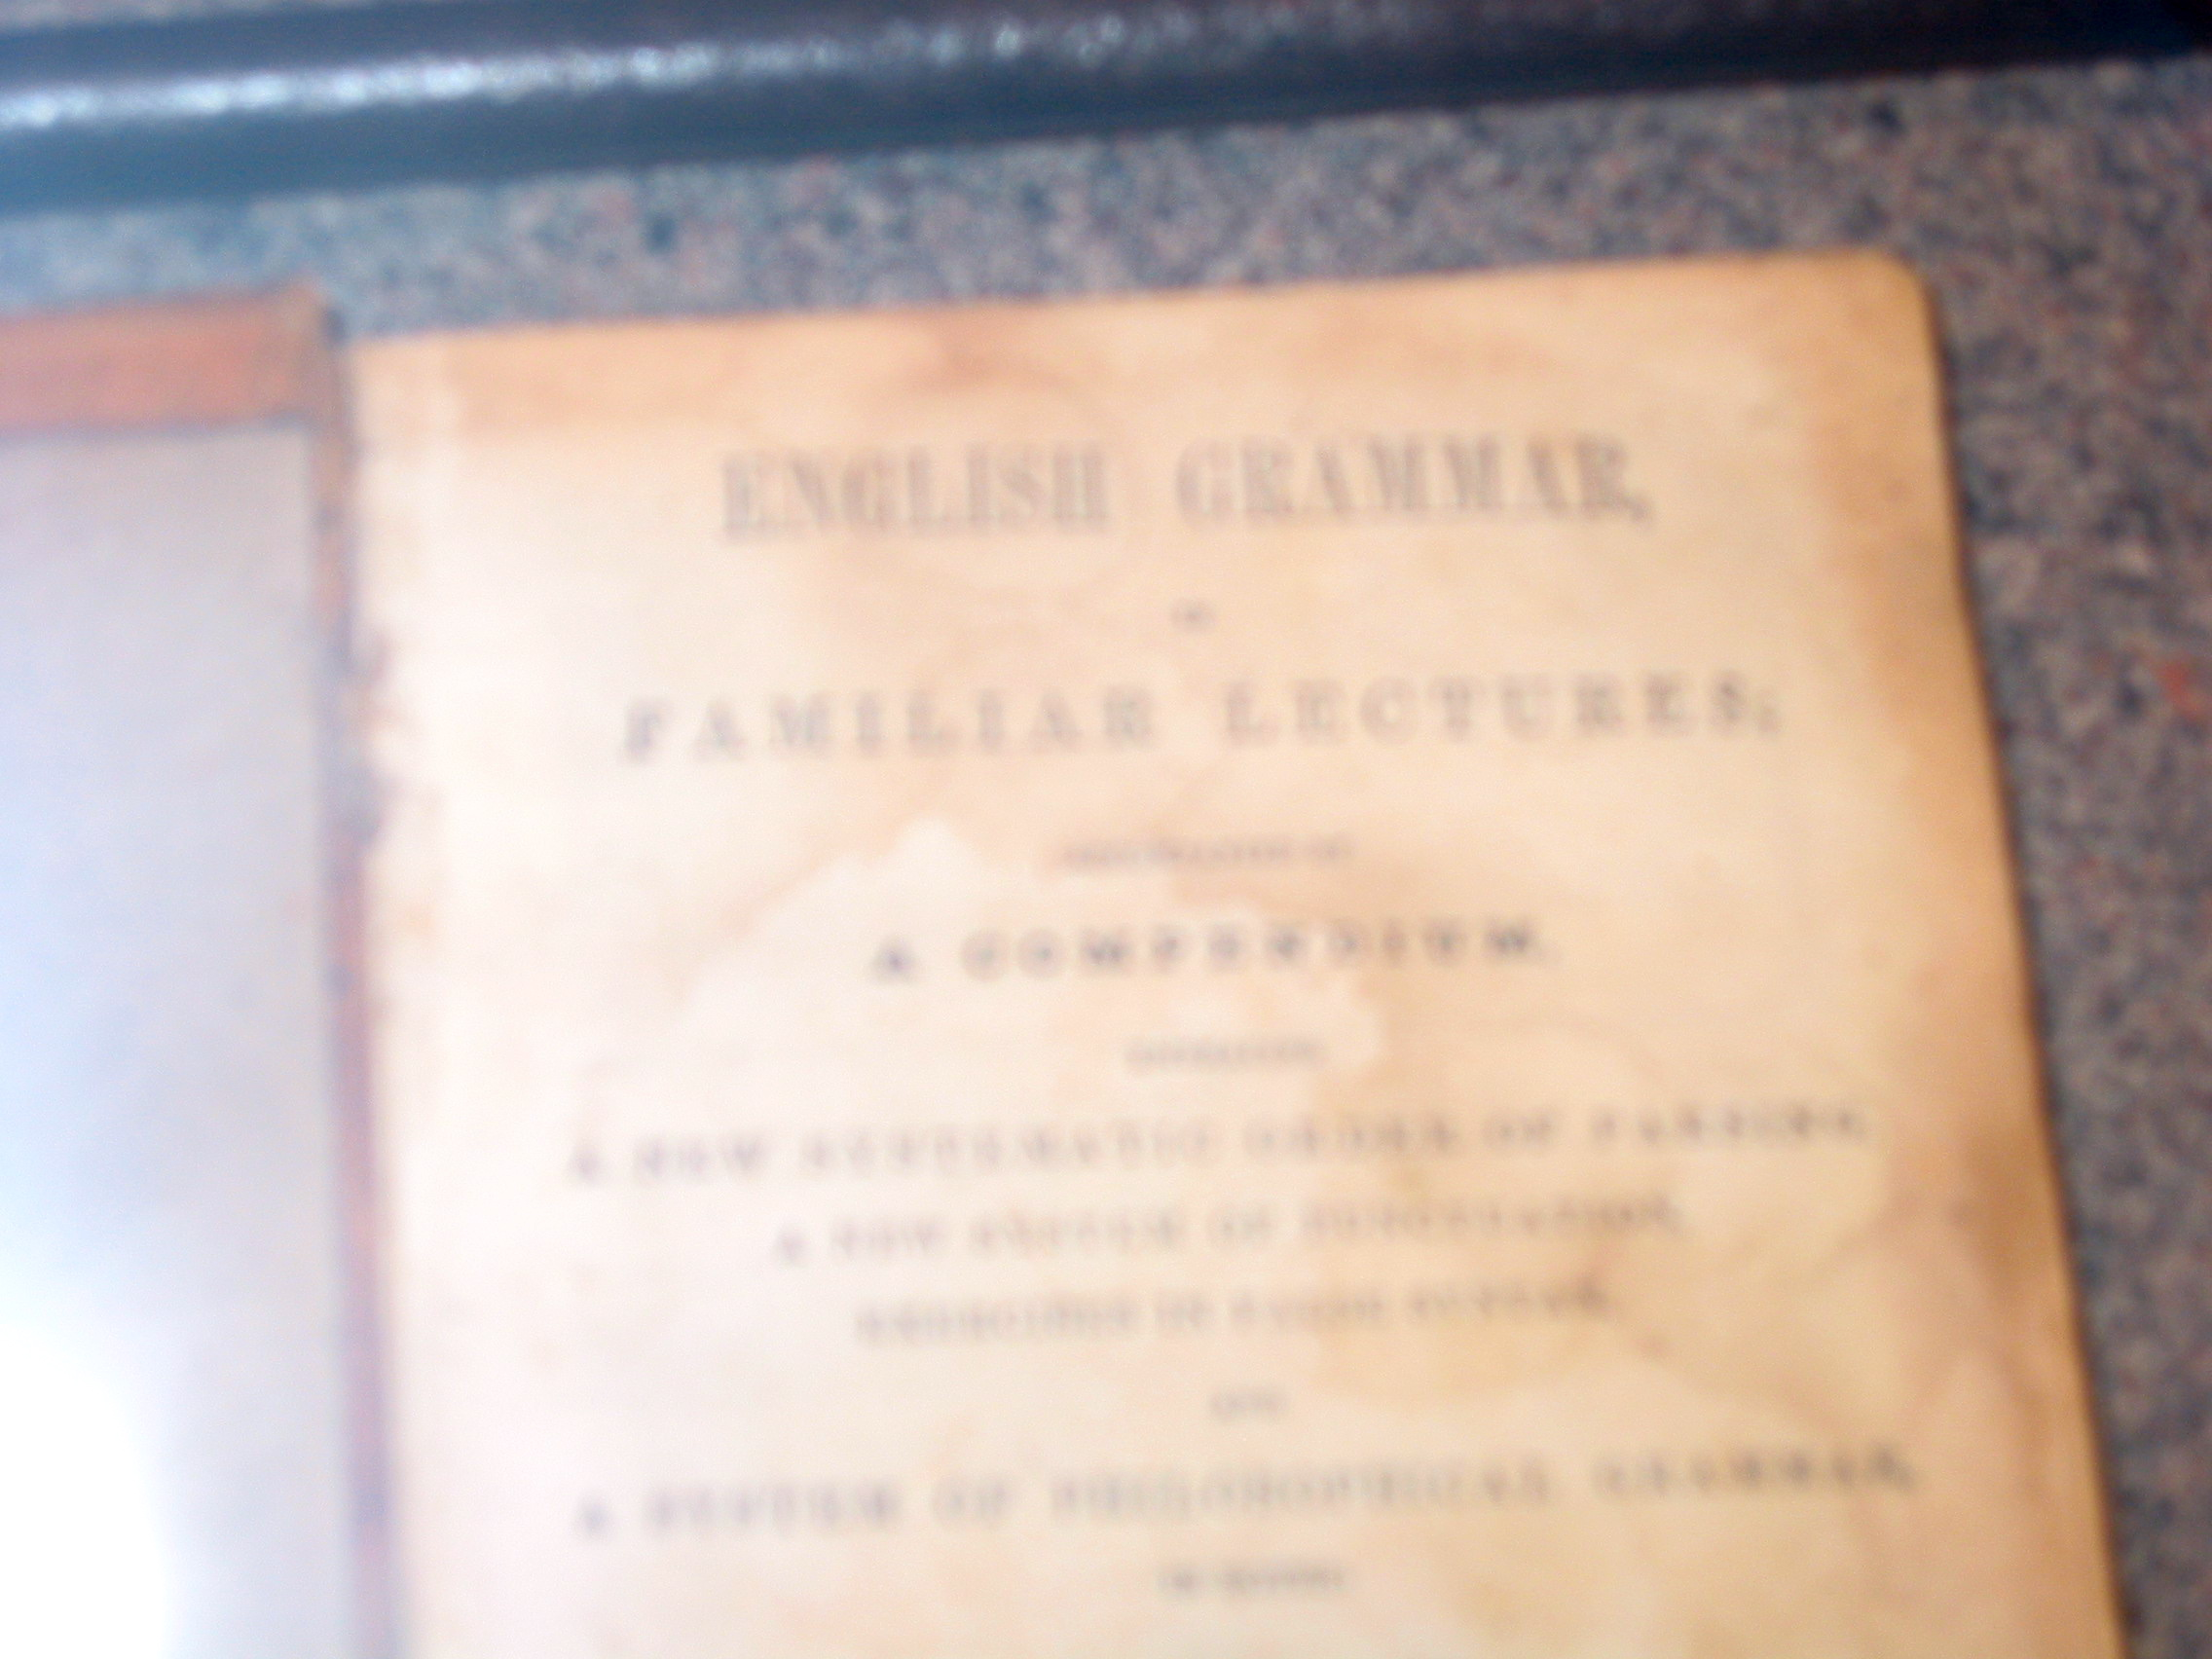 Abe Lincoln's grammar book